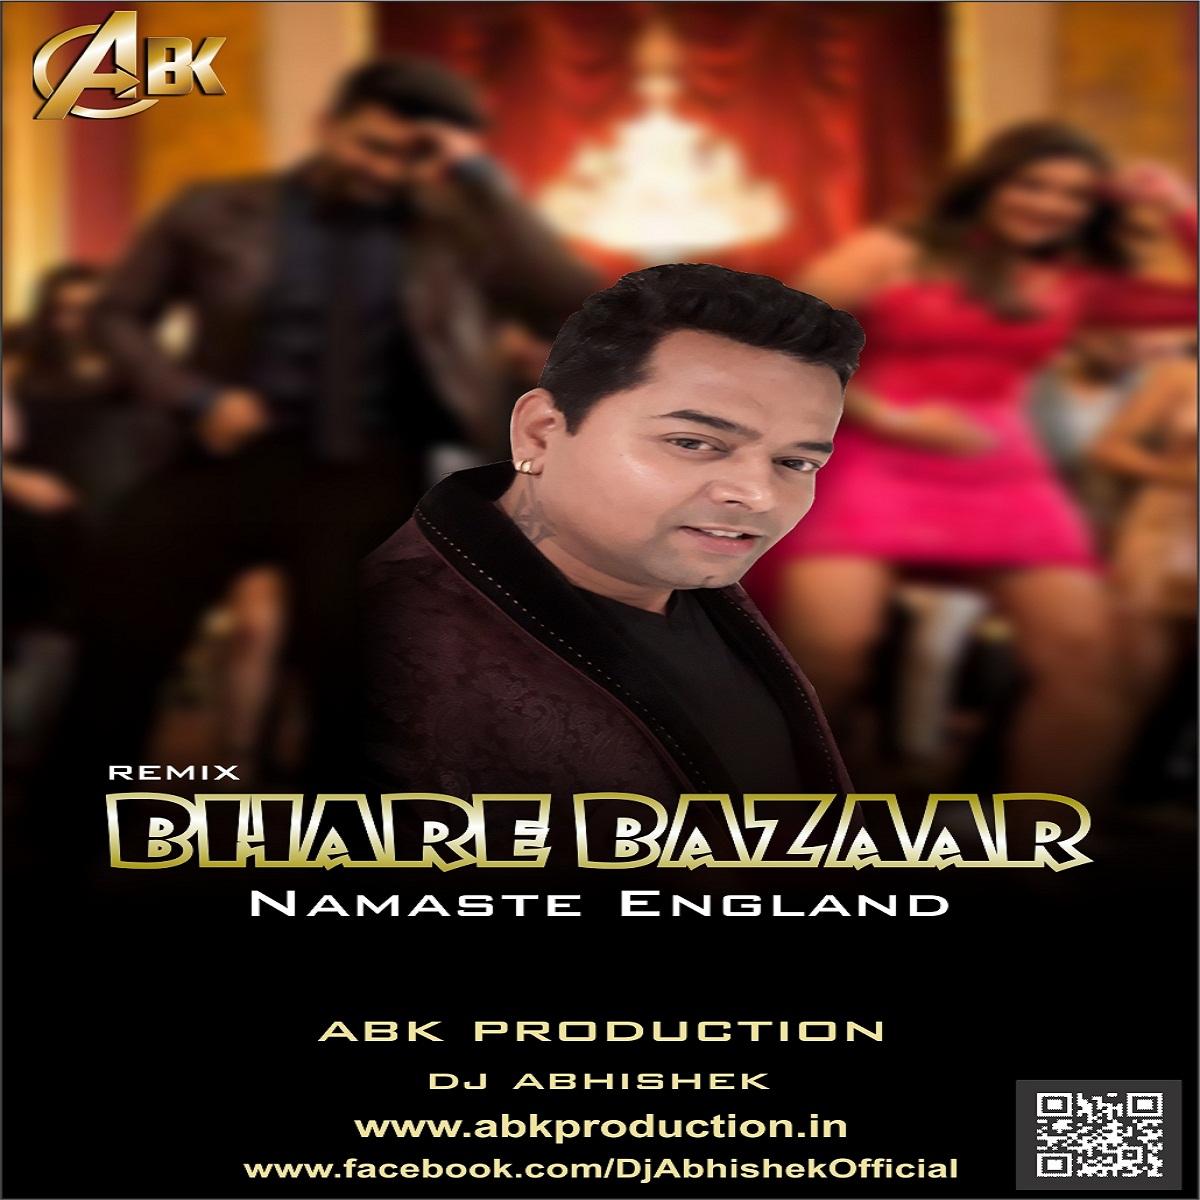 Bhagwa Rang Dj: Bhare Bazaar ( Namaste England ) Abk Production